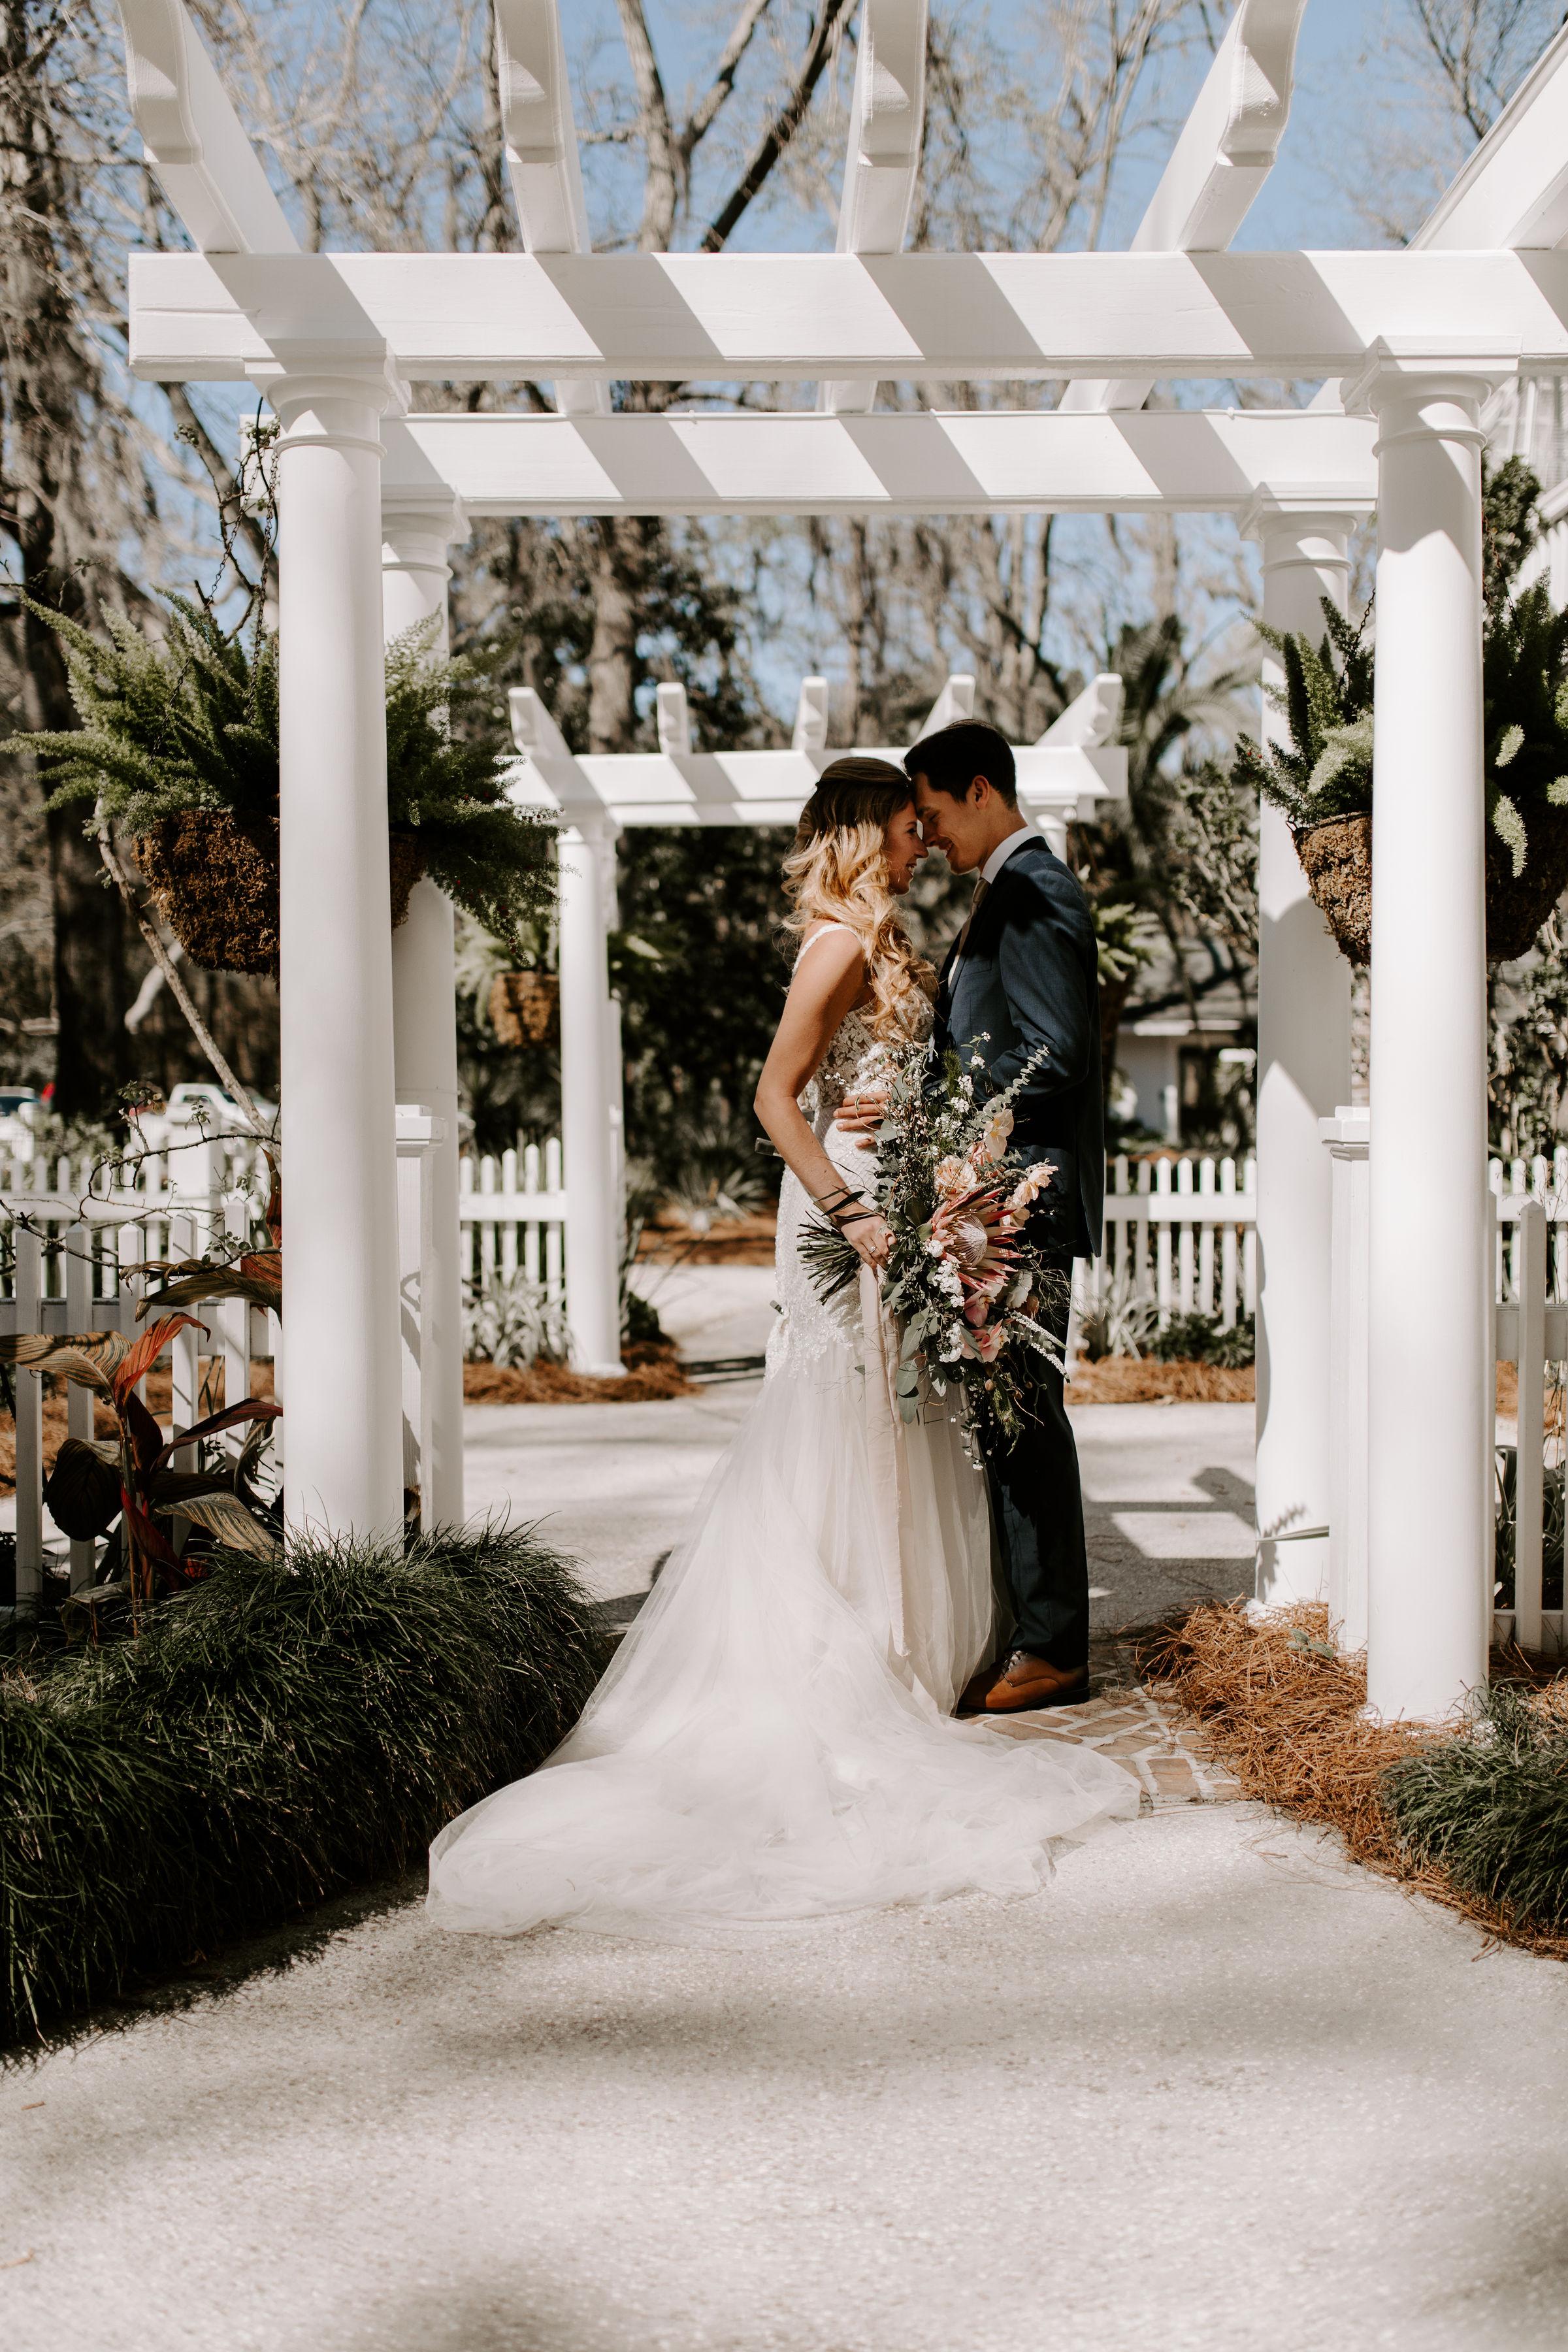 ivory-and-beau-blog-mackey-house-styled-shoot-savannah-wedding-bridal-boutique-savannah-florist-southern-wedding-_G5A1553.jpg